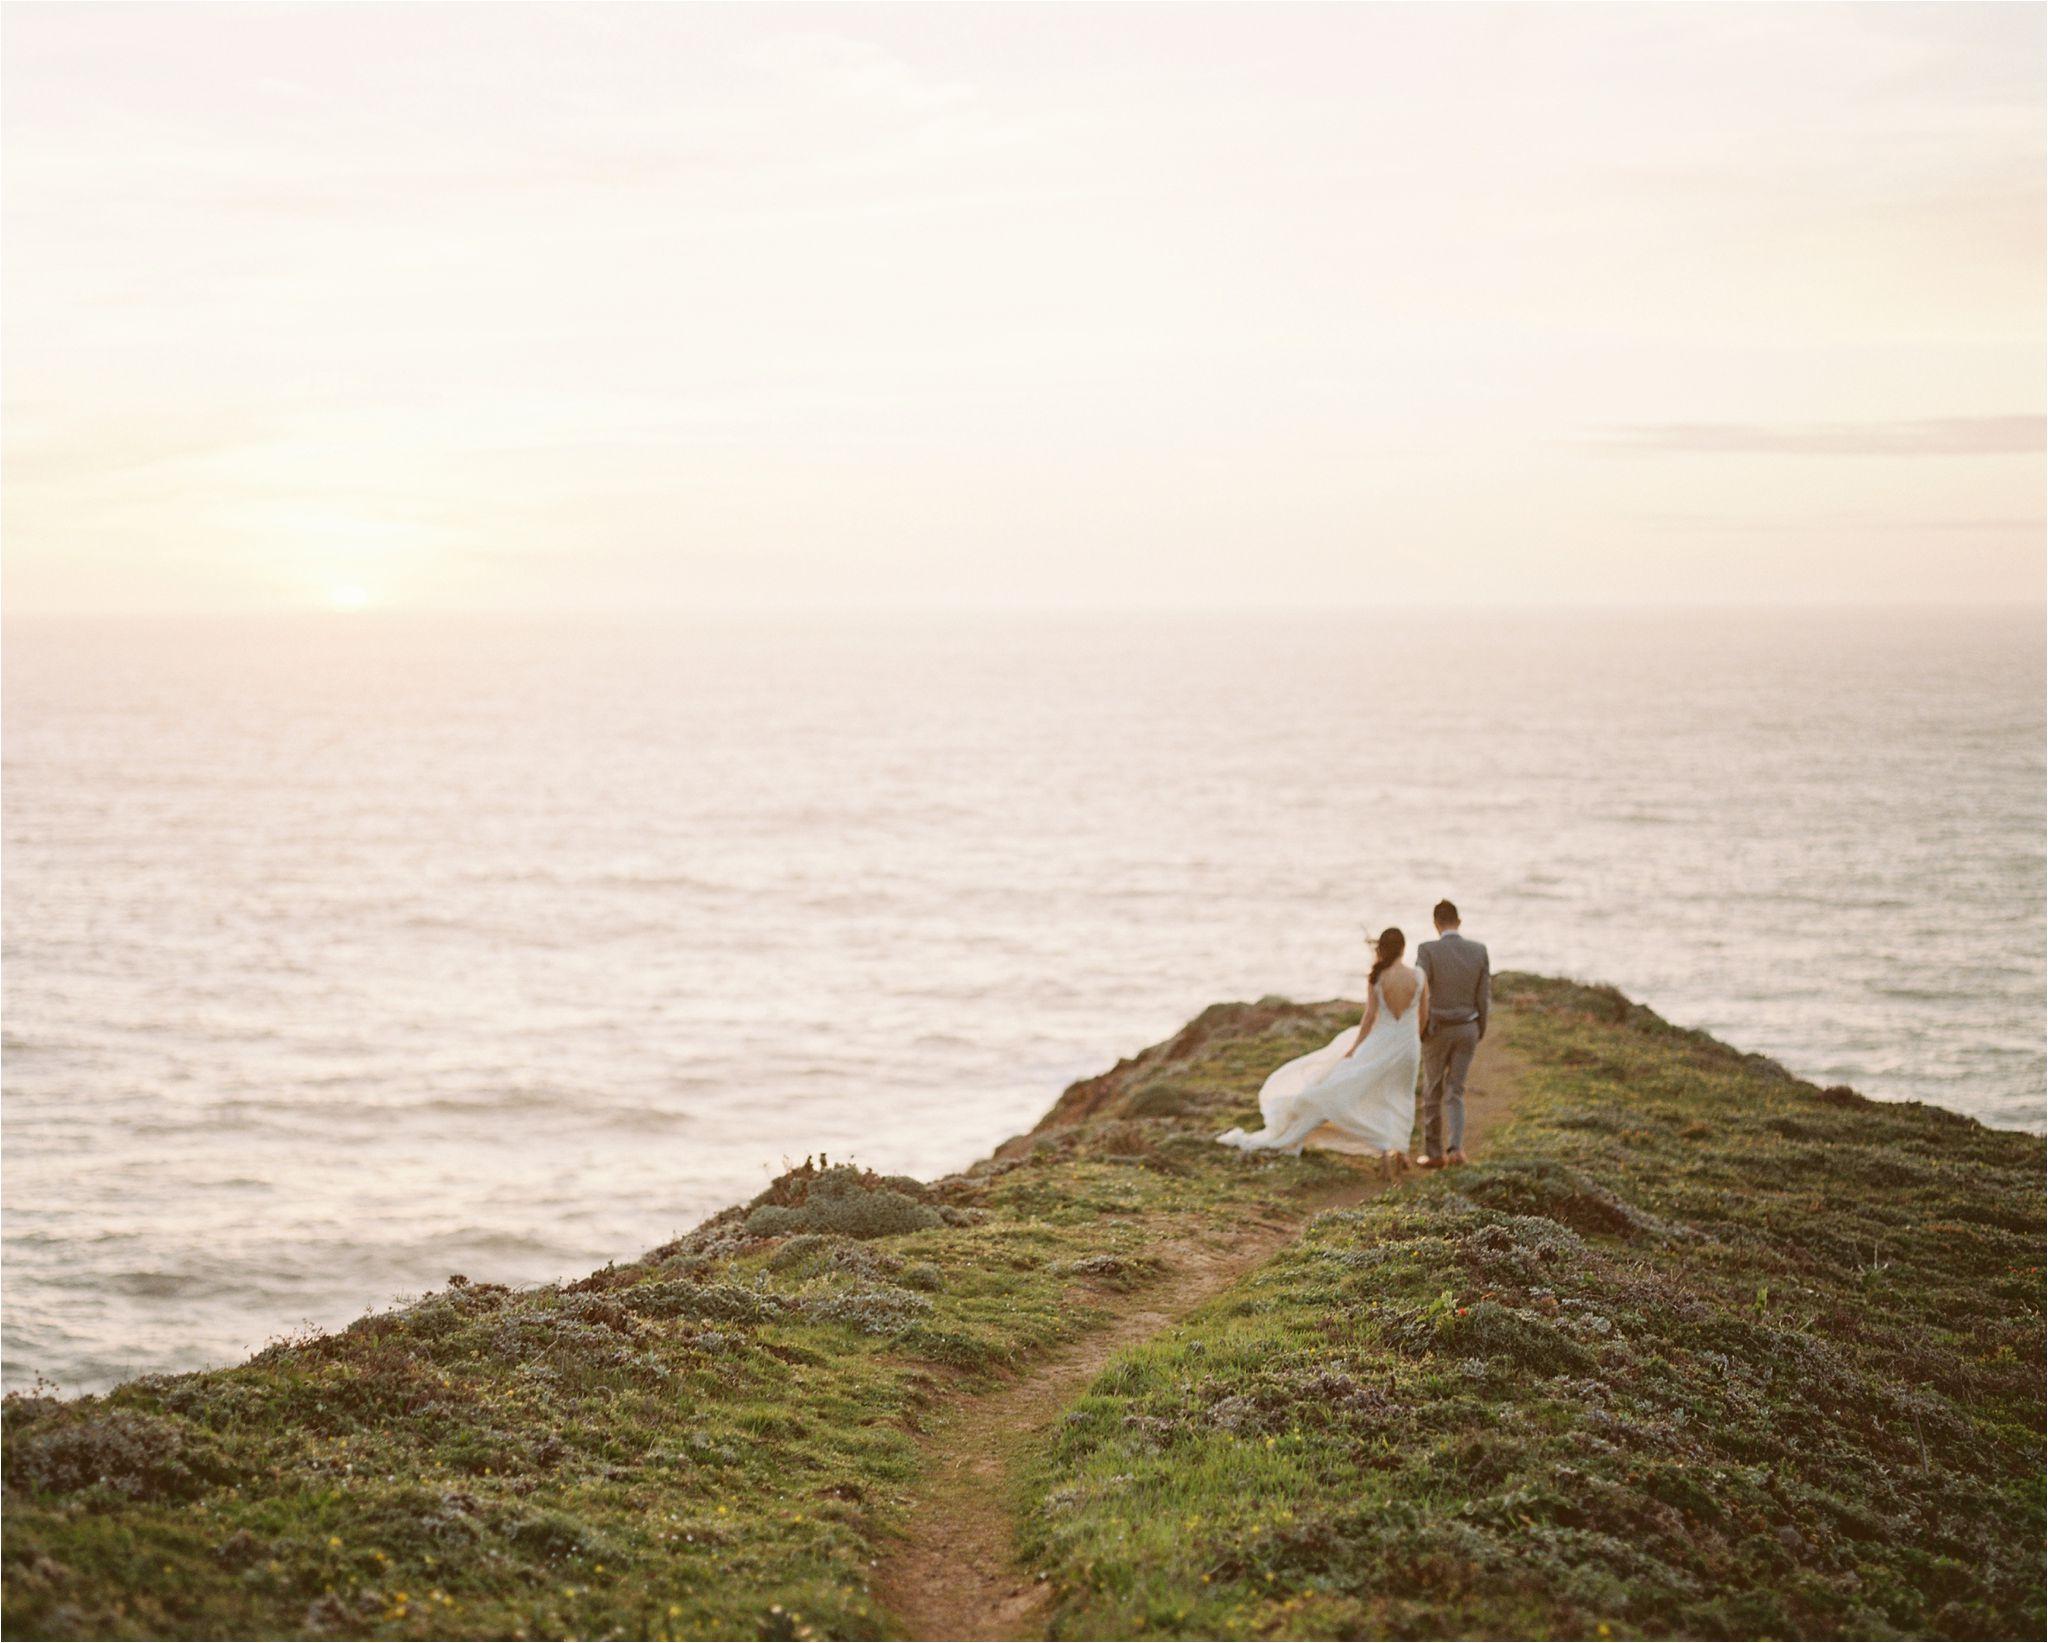 california_coast_mendicino_cuffeyscoveranch_wedding_elopement_photography00070.jpg